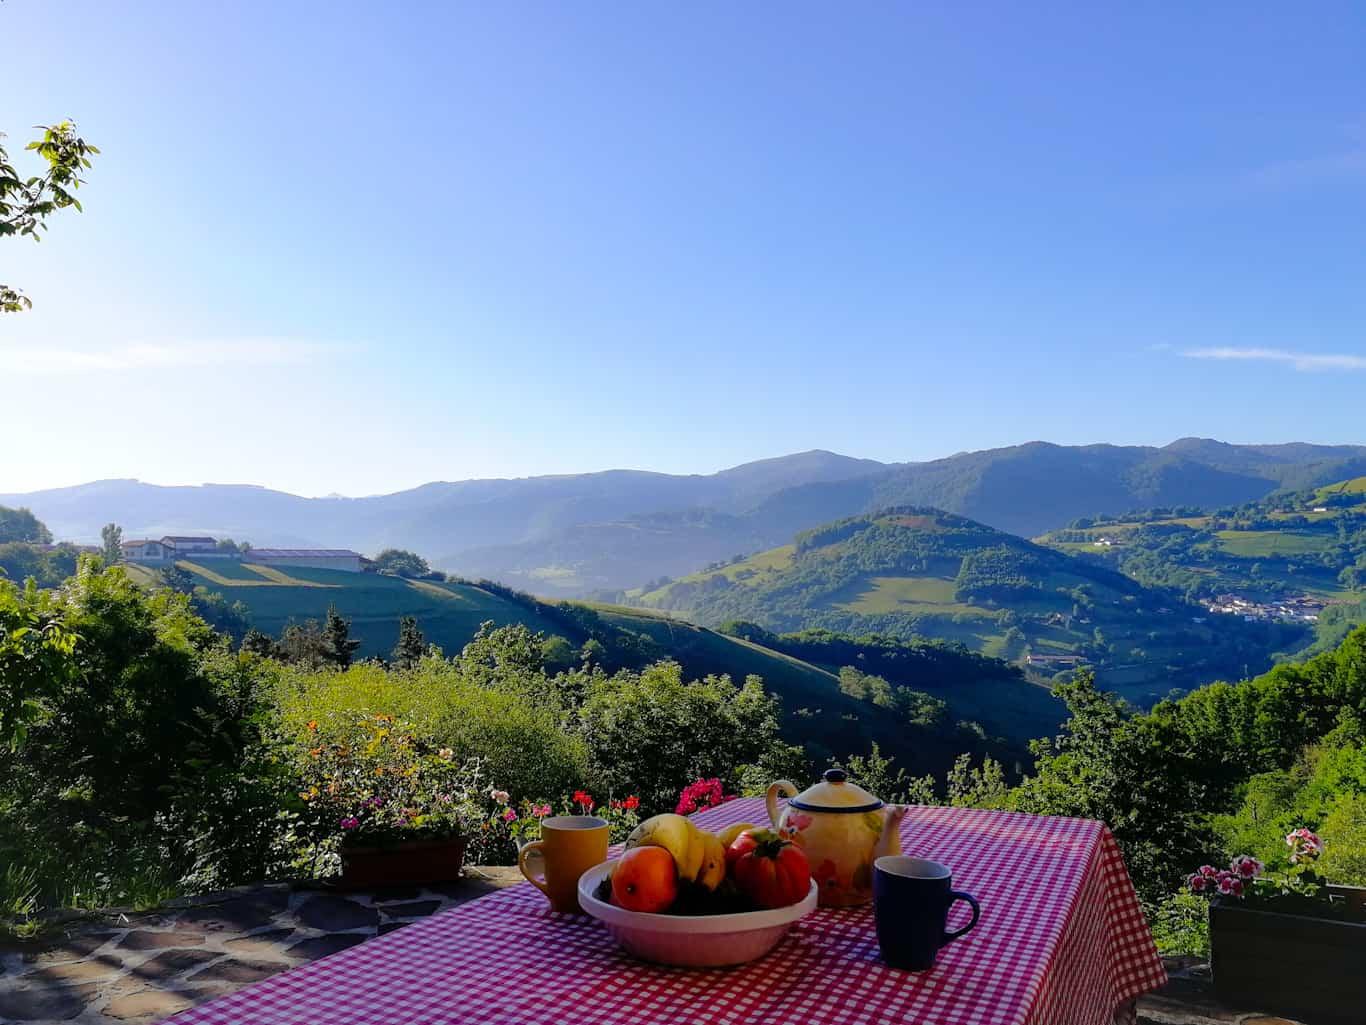 Breakfast in the Baztan Valley